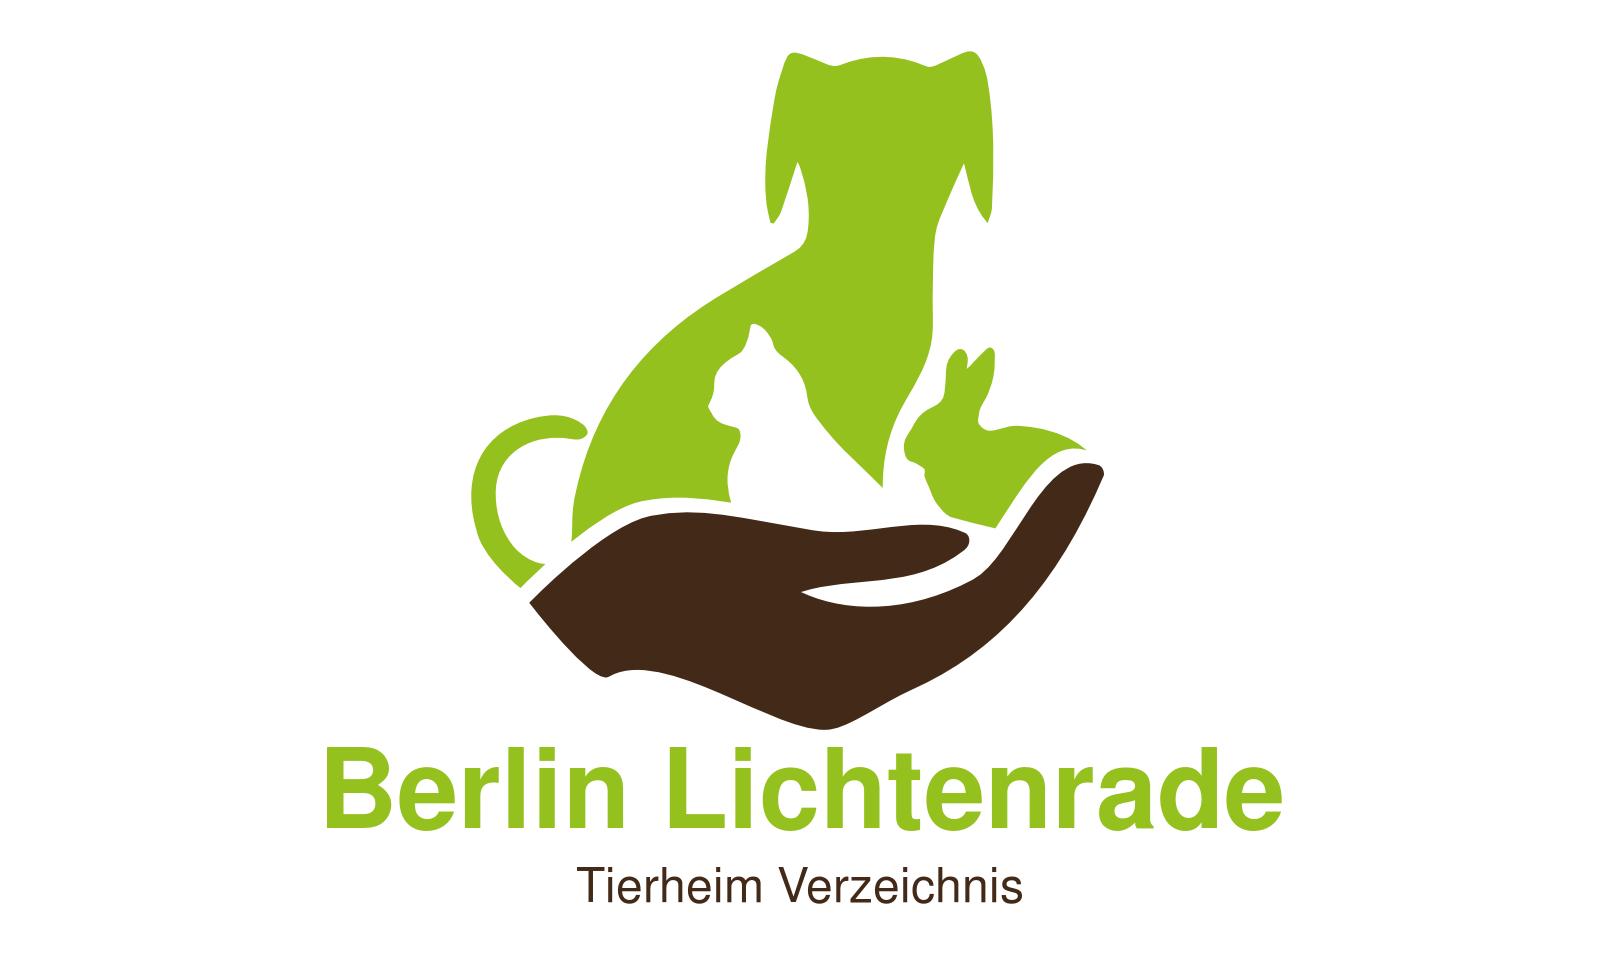 Tierheim Berlin Lichtenrade